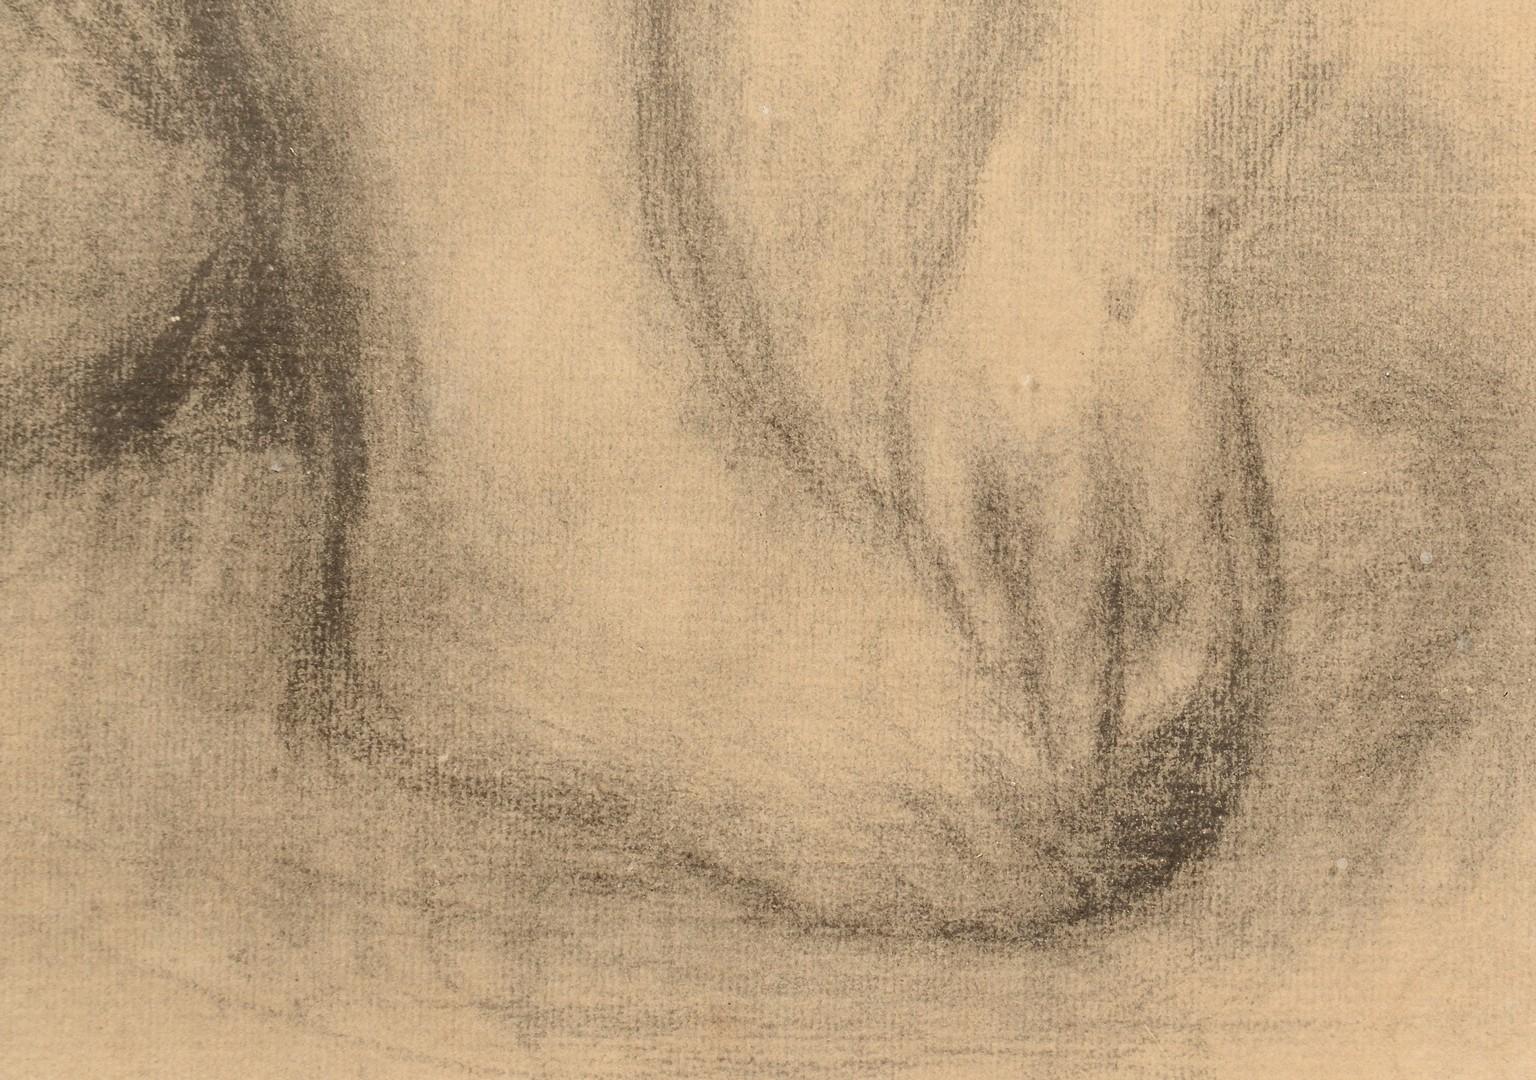 Lot 163: Enrique Alferez Drawing